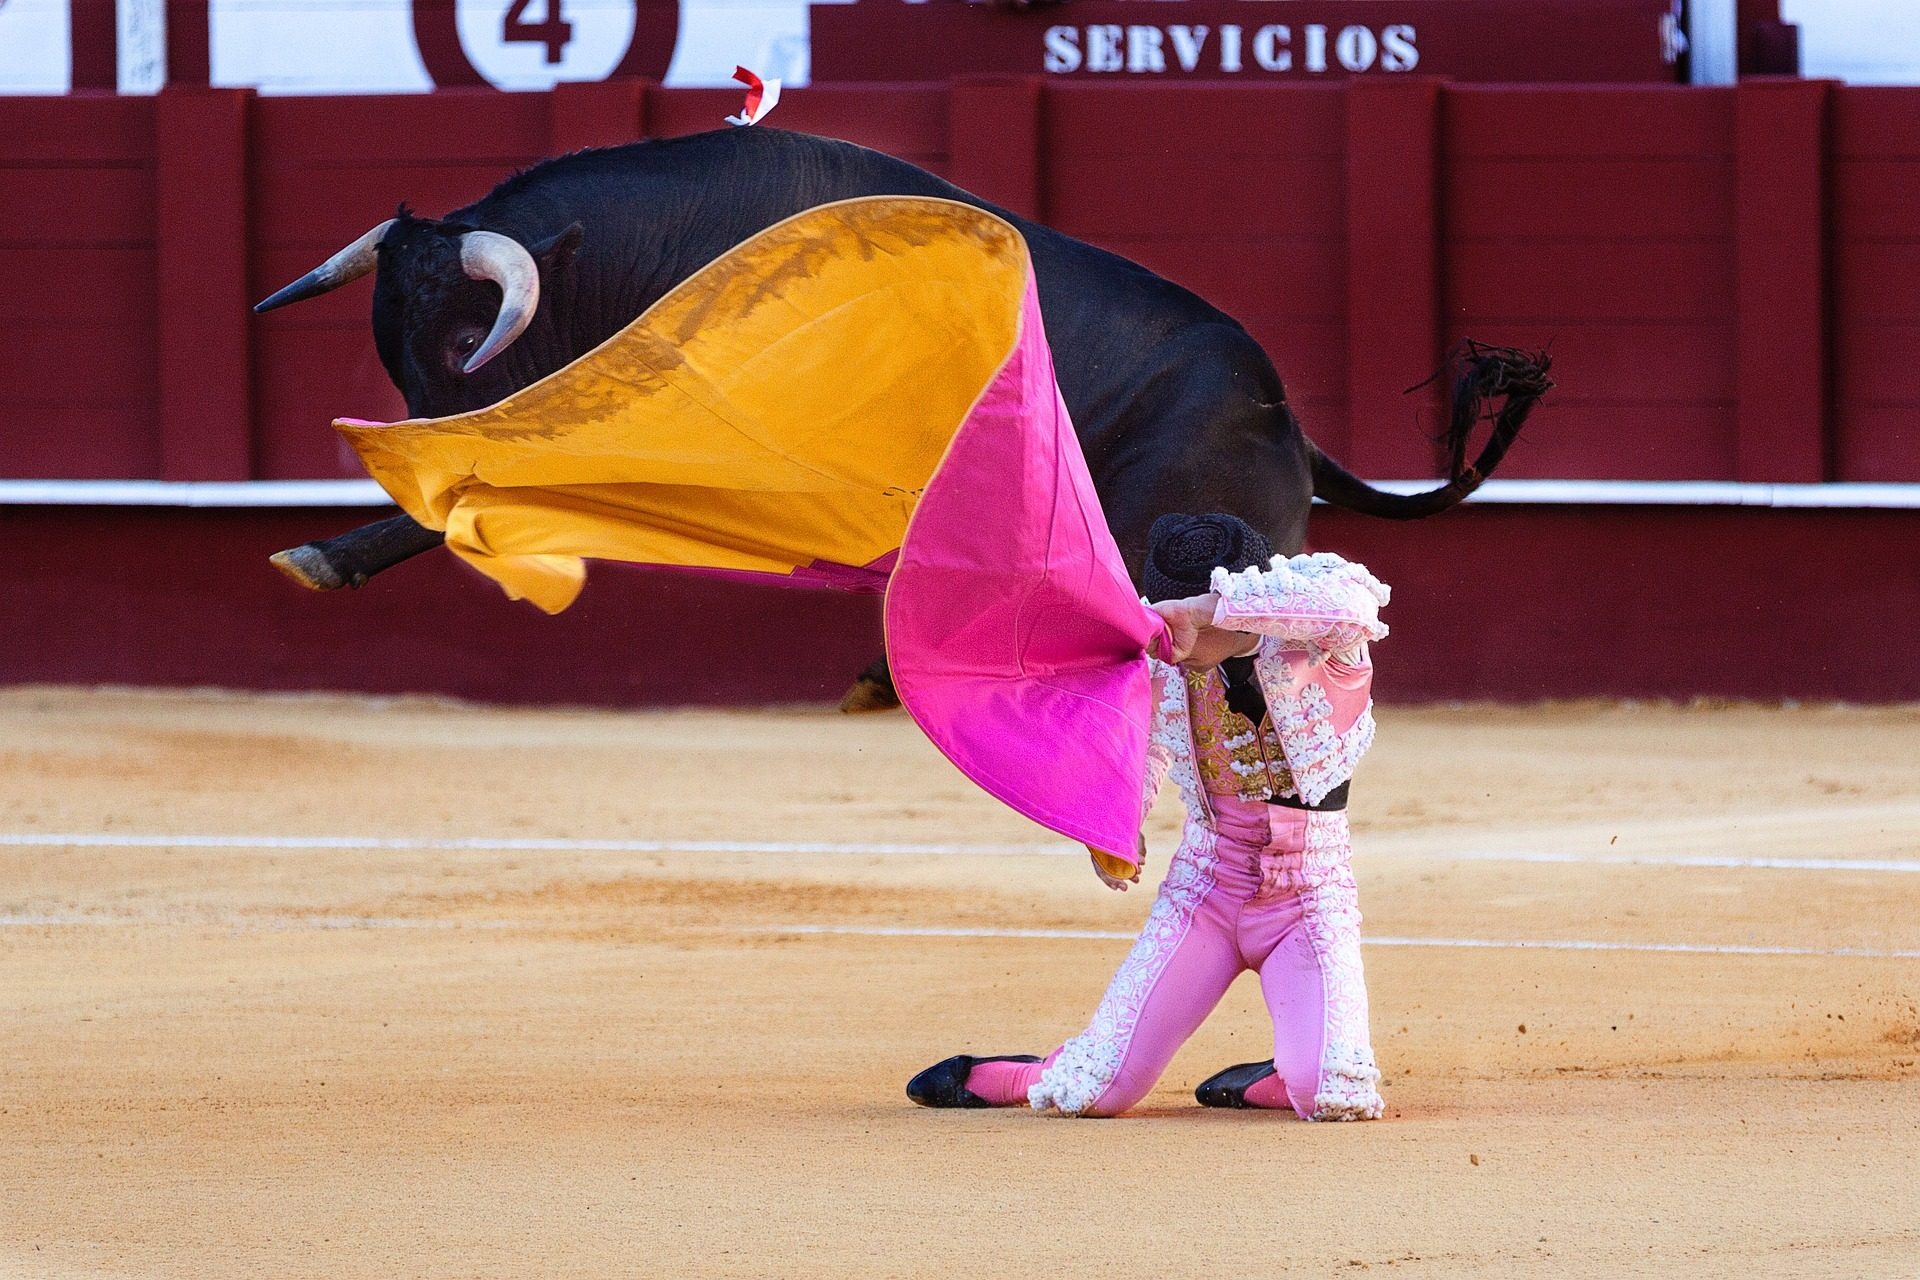 corrida, トロ, torero, お祝い, コスチューム, ライト, スペイン - HD の壁紙 - 教授-falken.com